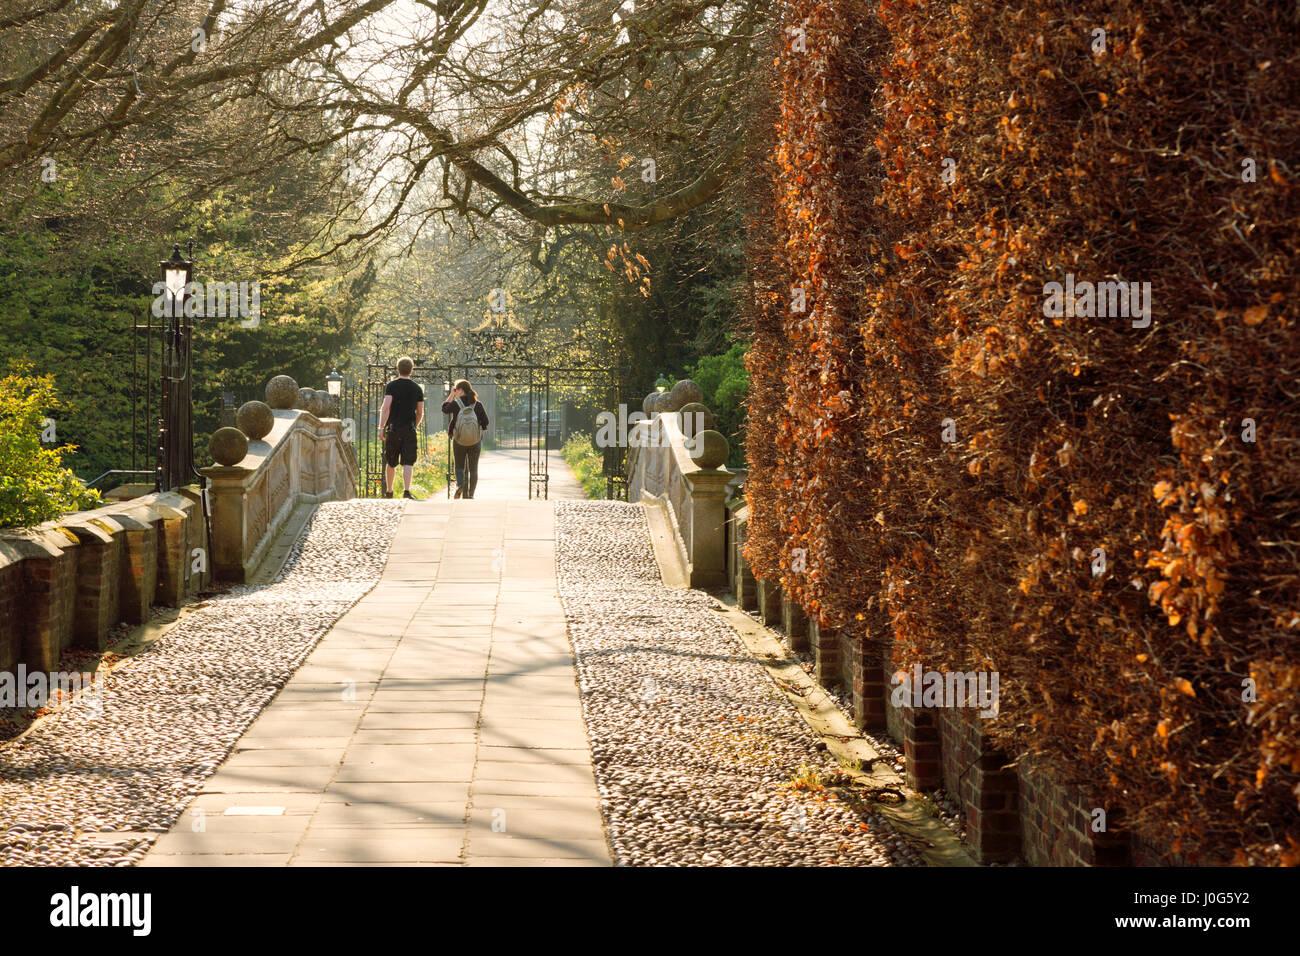 University of Cambridge - People walking in the grounds of Clare College Cambridge University, Cambridge UK - Stock Image